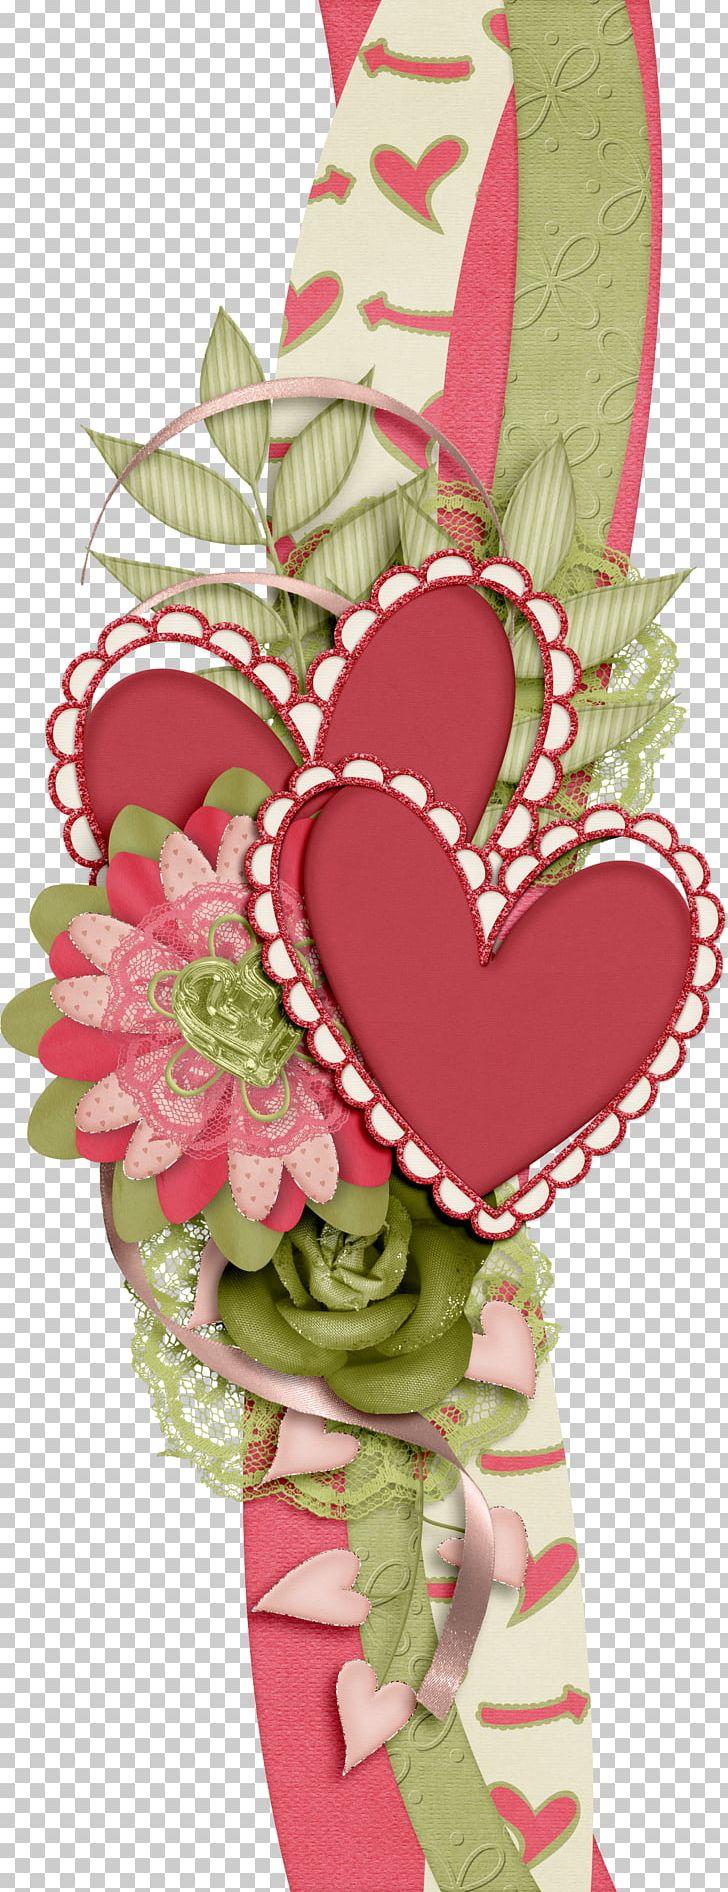 Paper Digital Scrapbooking PNG, Clipart, Clip Art, Collage, Cut Flowers, Digital Scrapbooking, Floral Design Free PNG Download